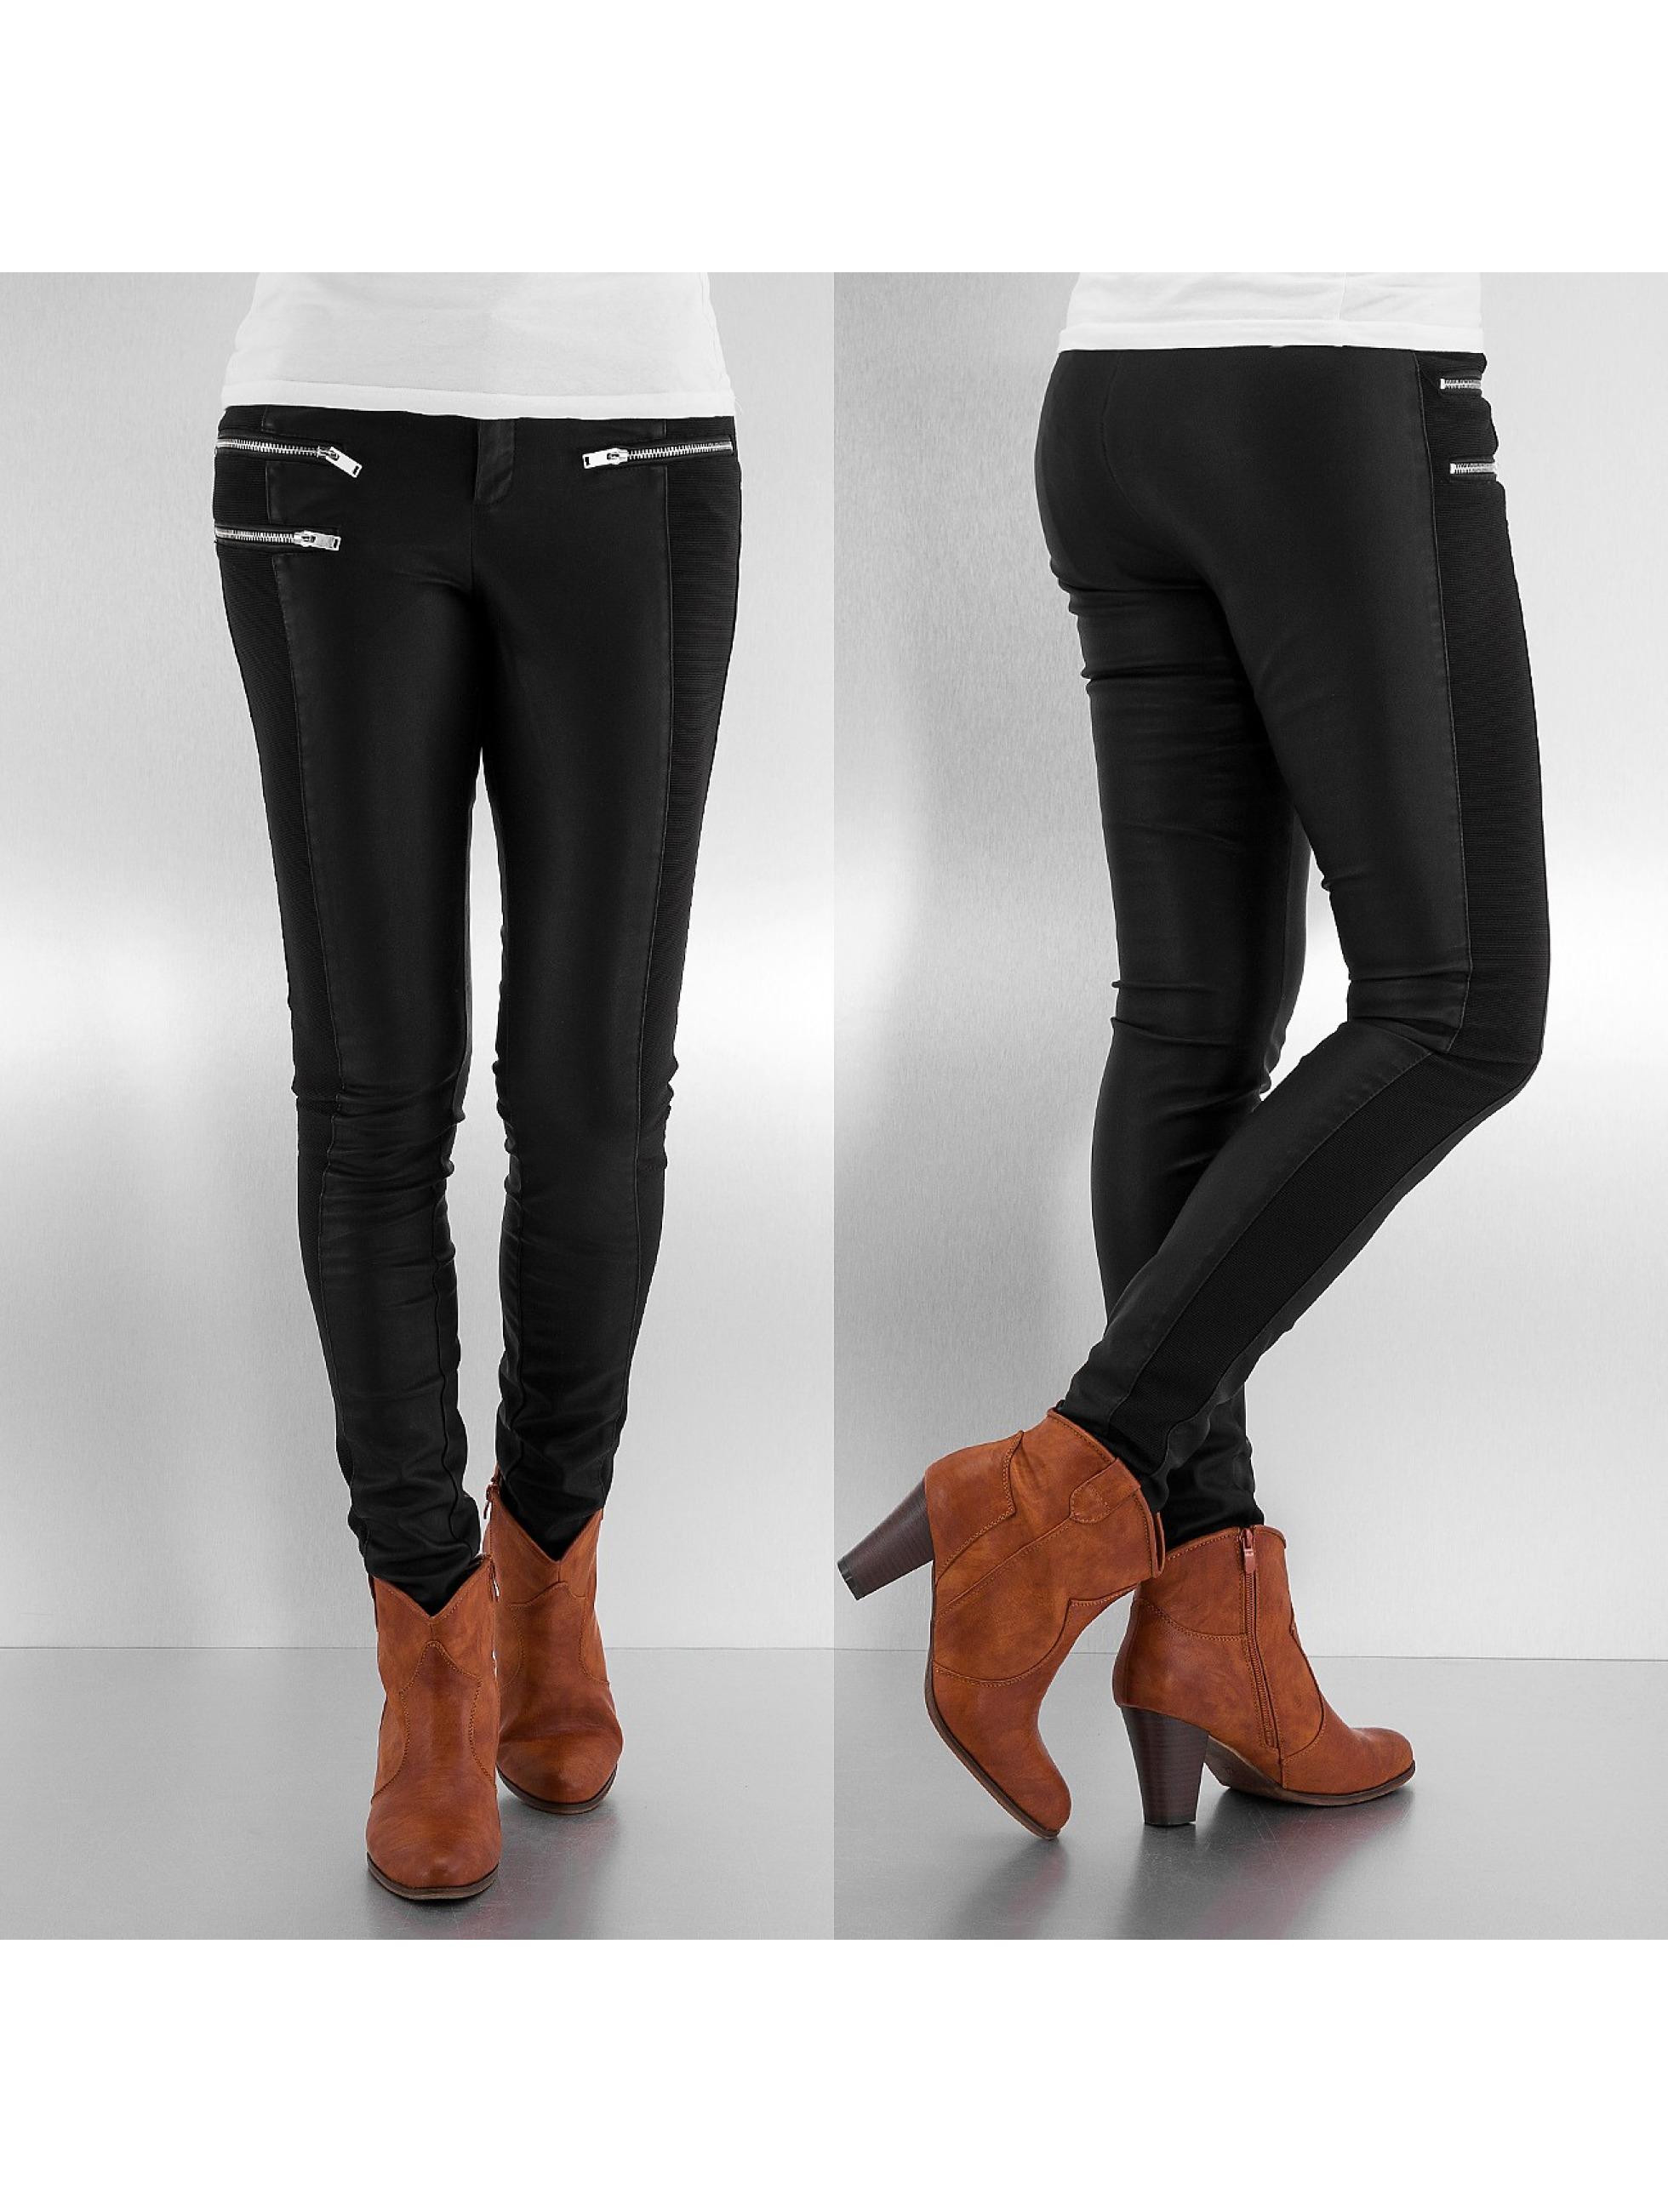 Legging Forever PU in schwarz